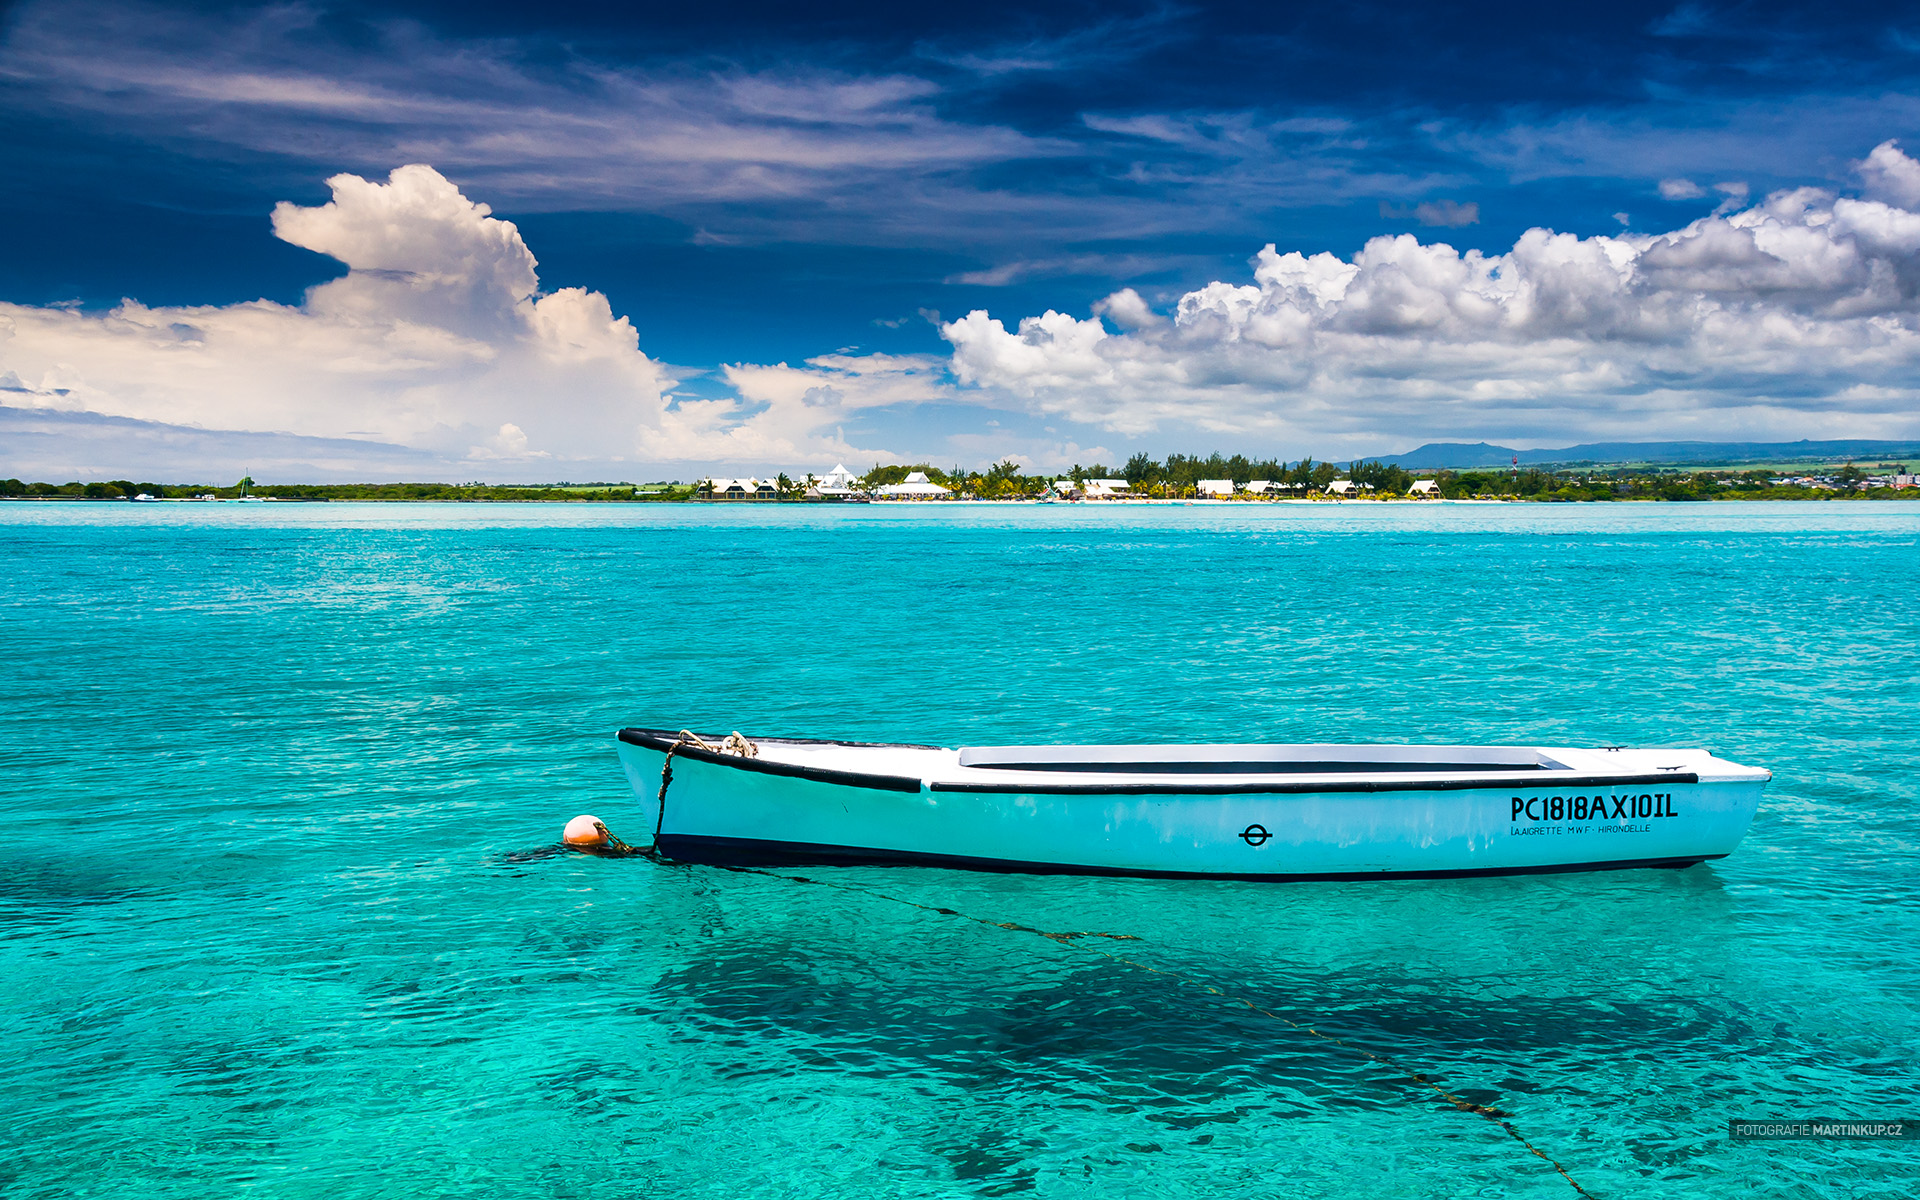 Tapeta na plochu: Blue Bay, Mauritius (16:10)